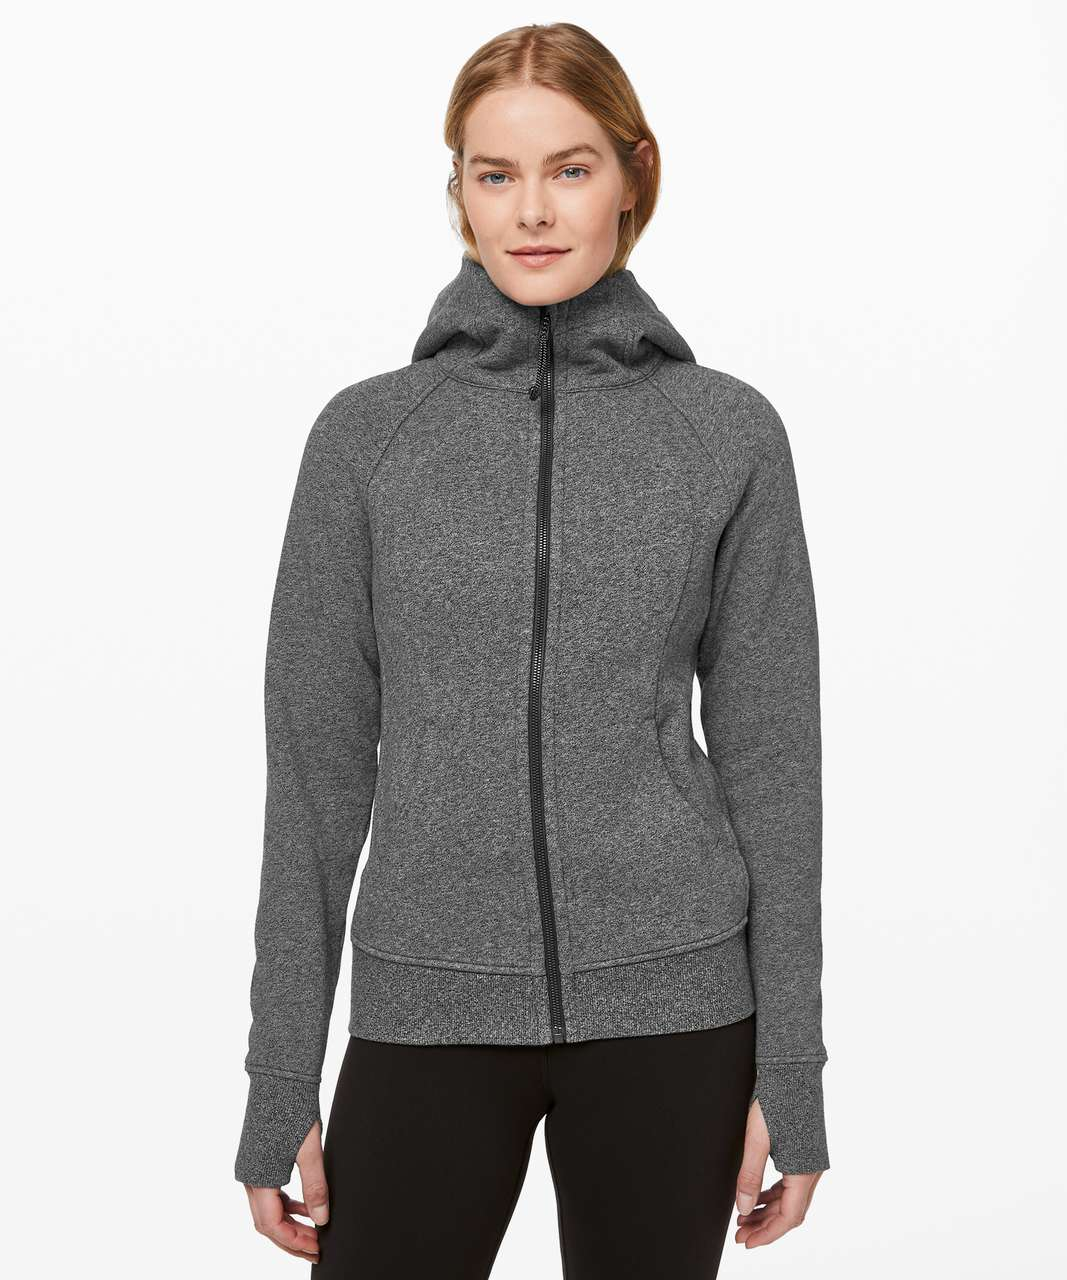 Lululemon Scuba Hoodie *Light Cotton Fleece - Heathered Speckled Black